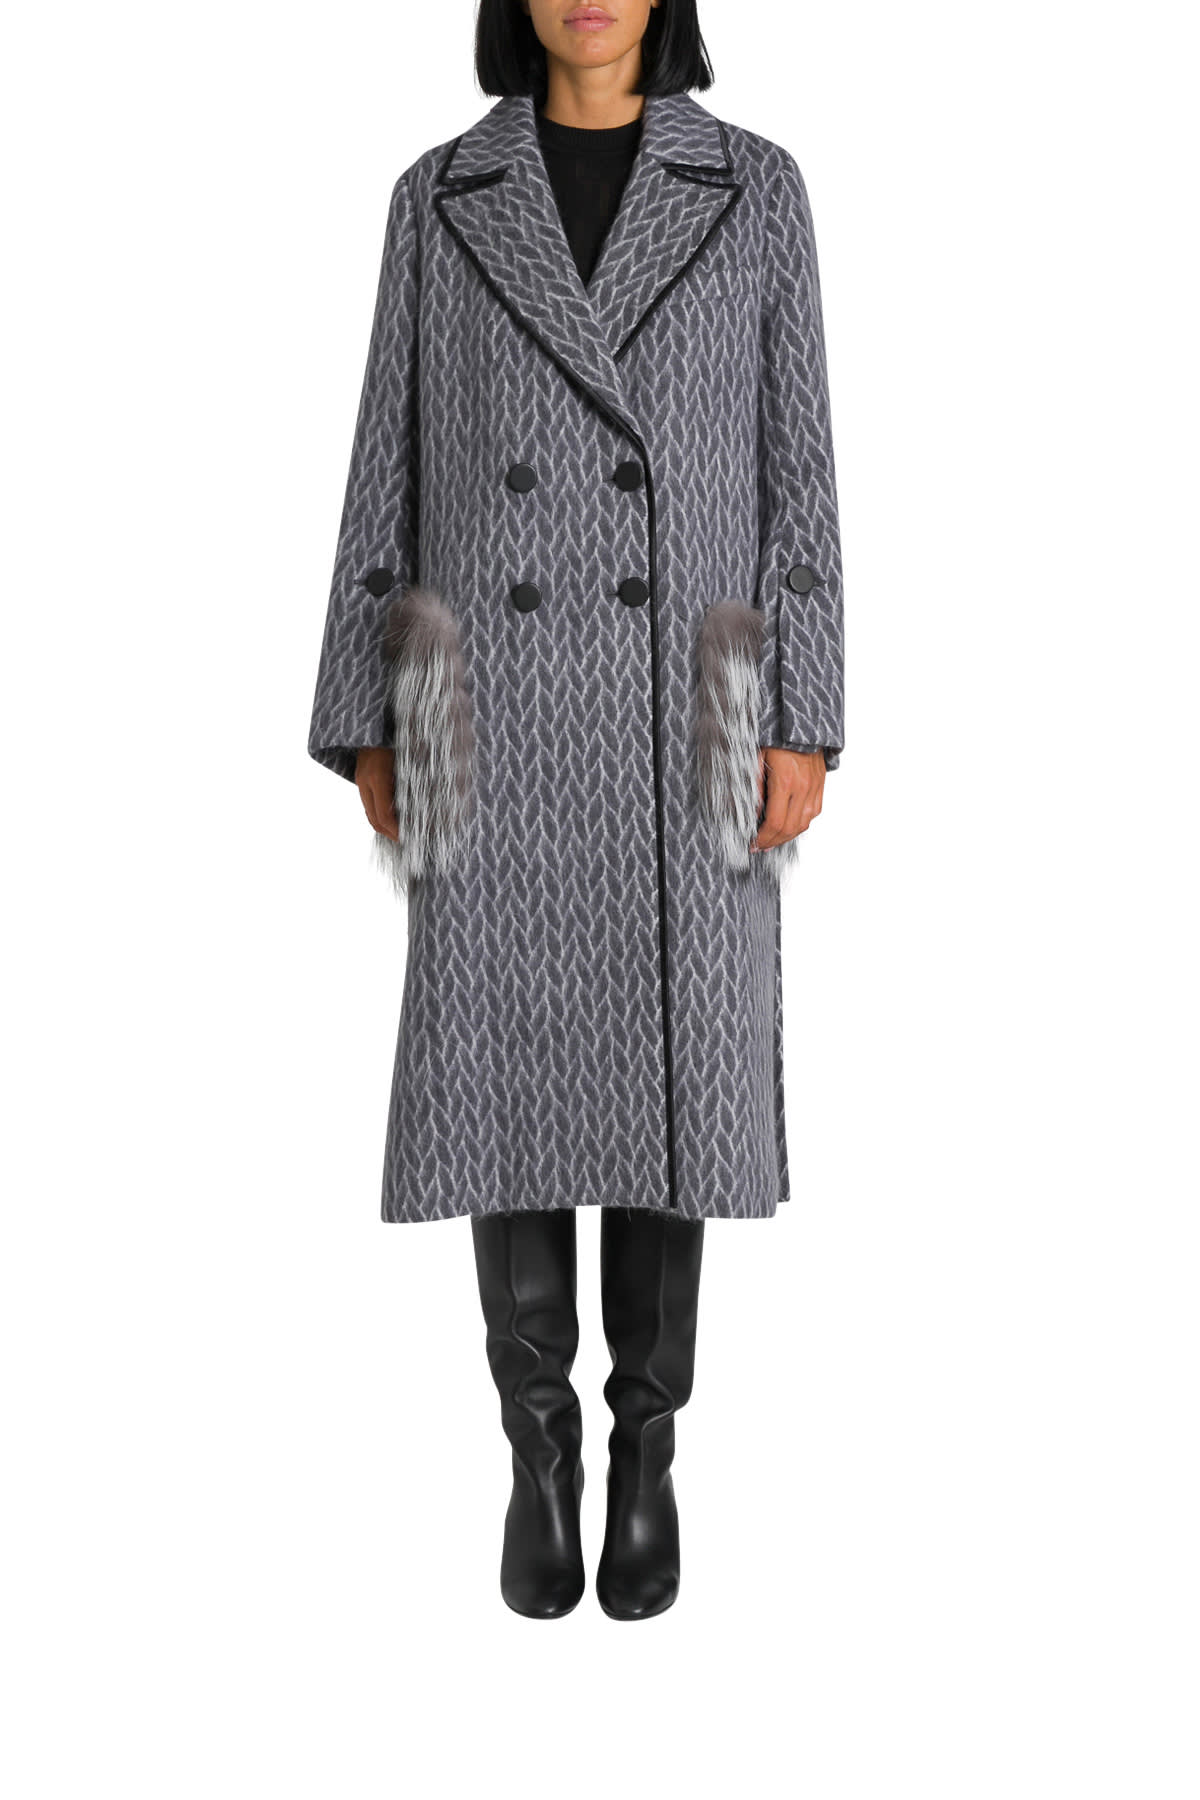 Fendi Coat With Fur Pockets